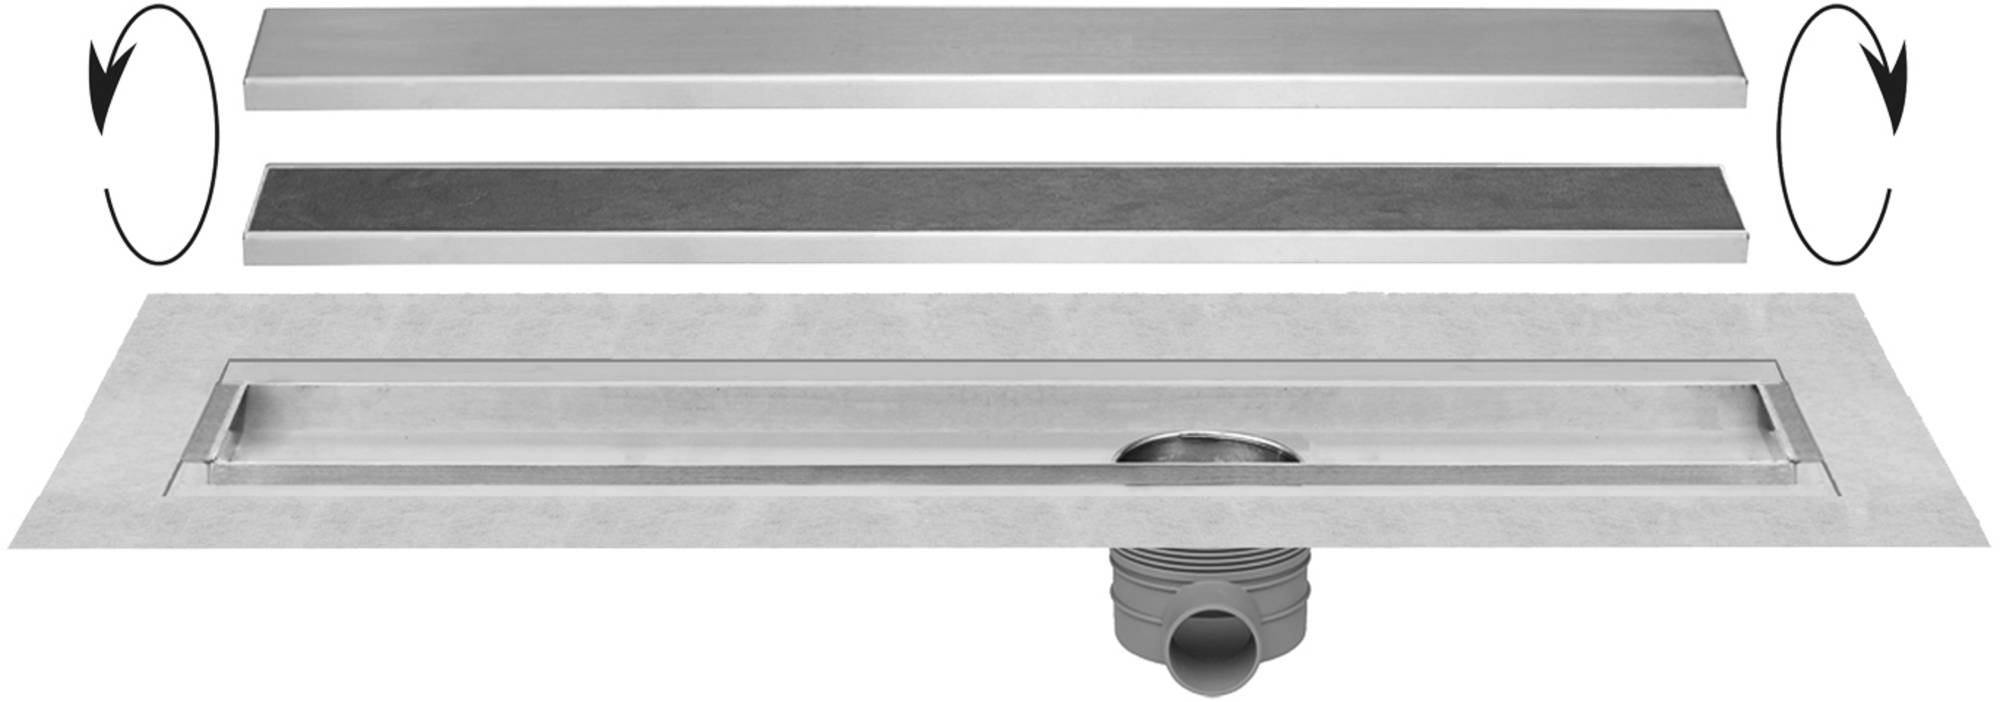 Easy Drain Multi TAF afvoergoot 80 cm rooster als zero of tegel design RVS